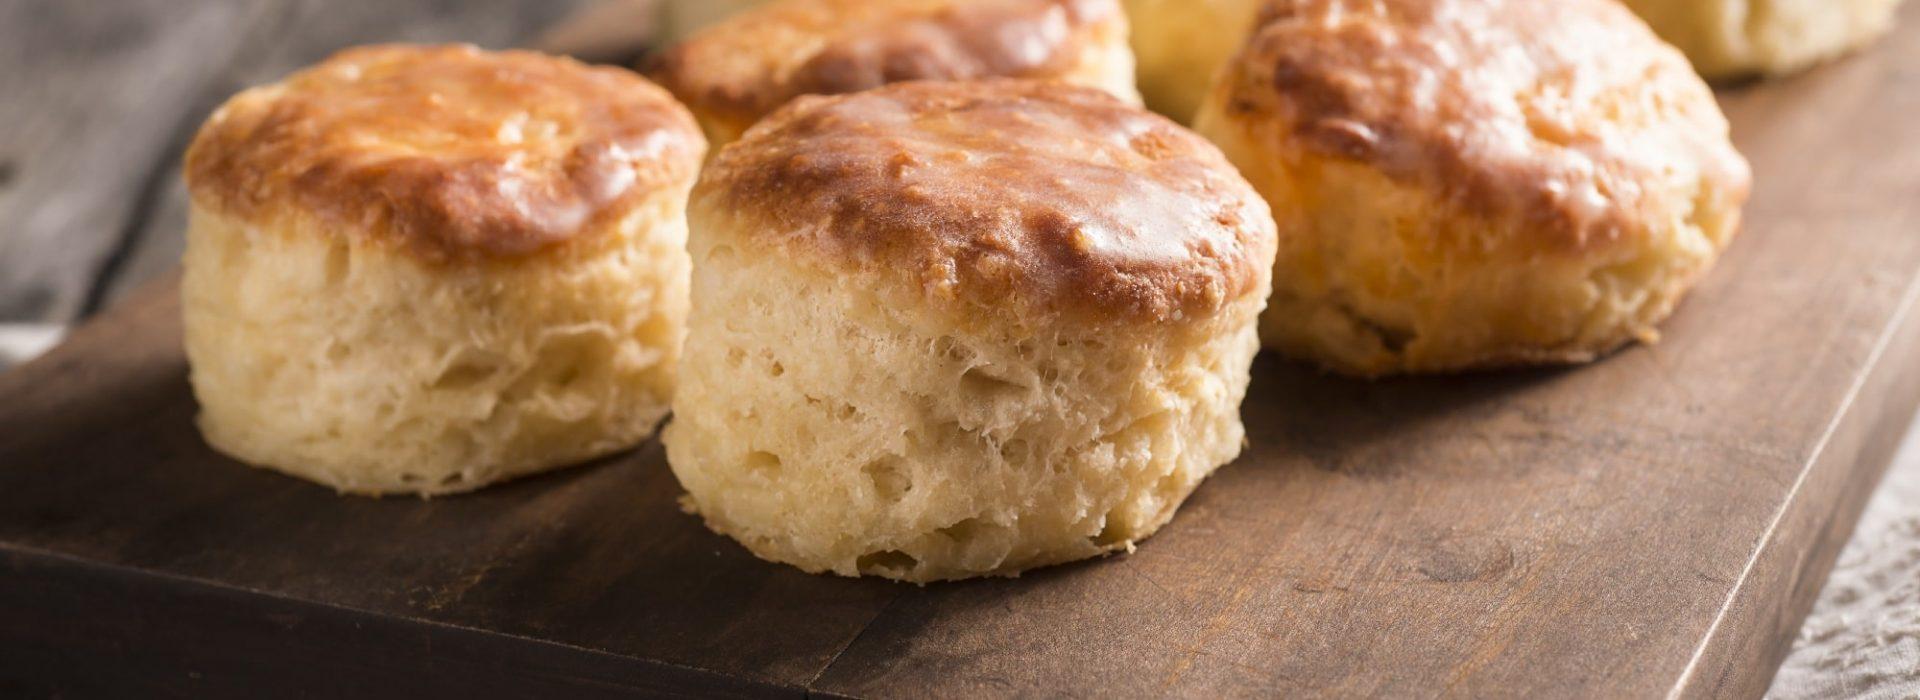 Buttermilk Biscuits Blog Image